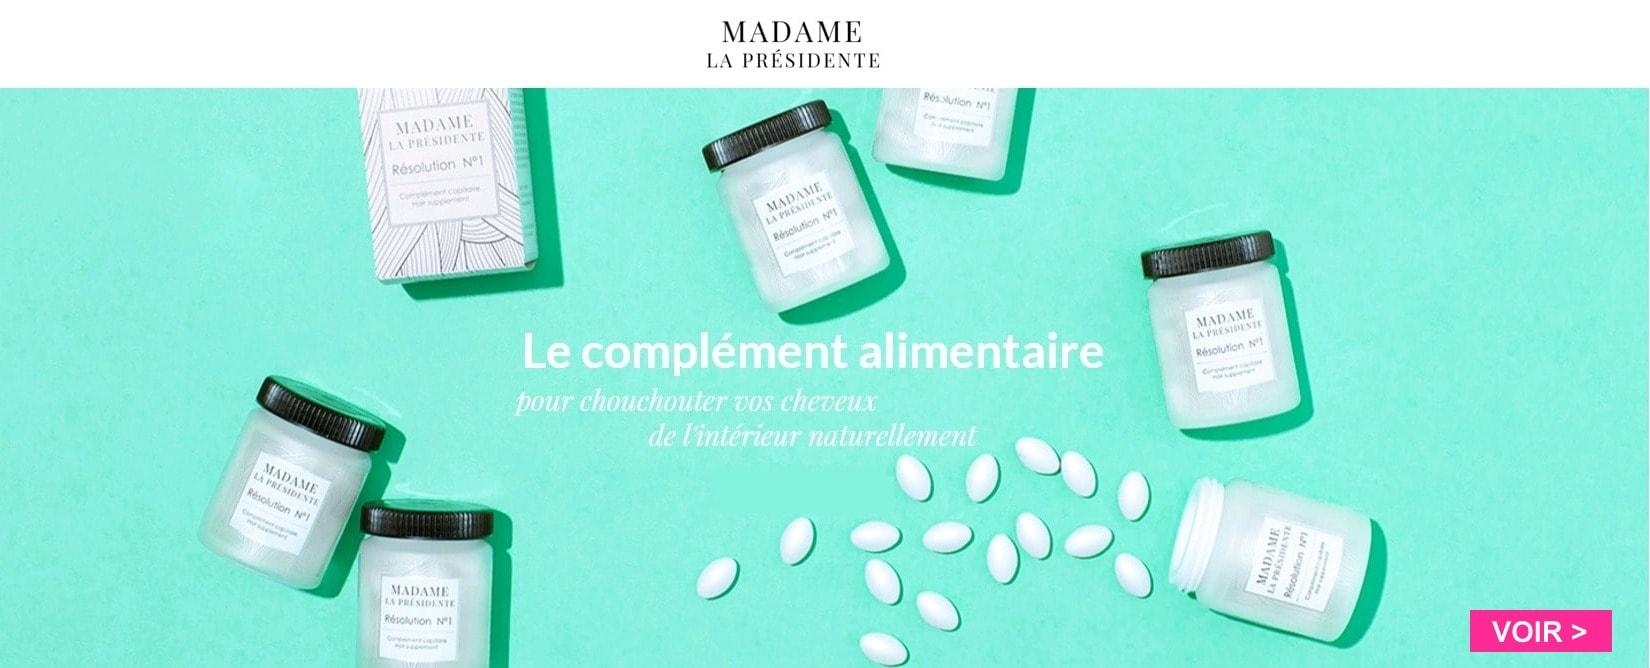 Nouvelle marque MADAME LA PRESIDENTE >